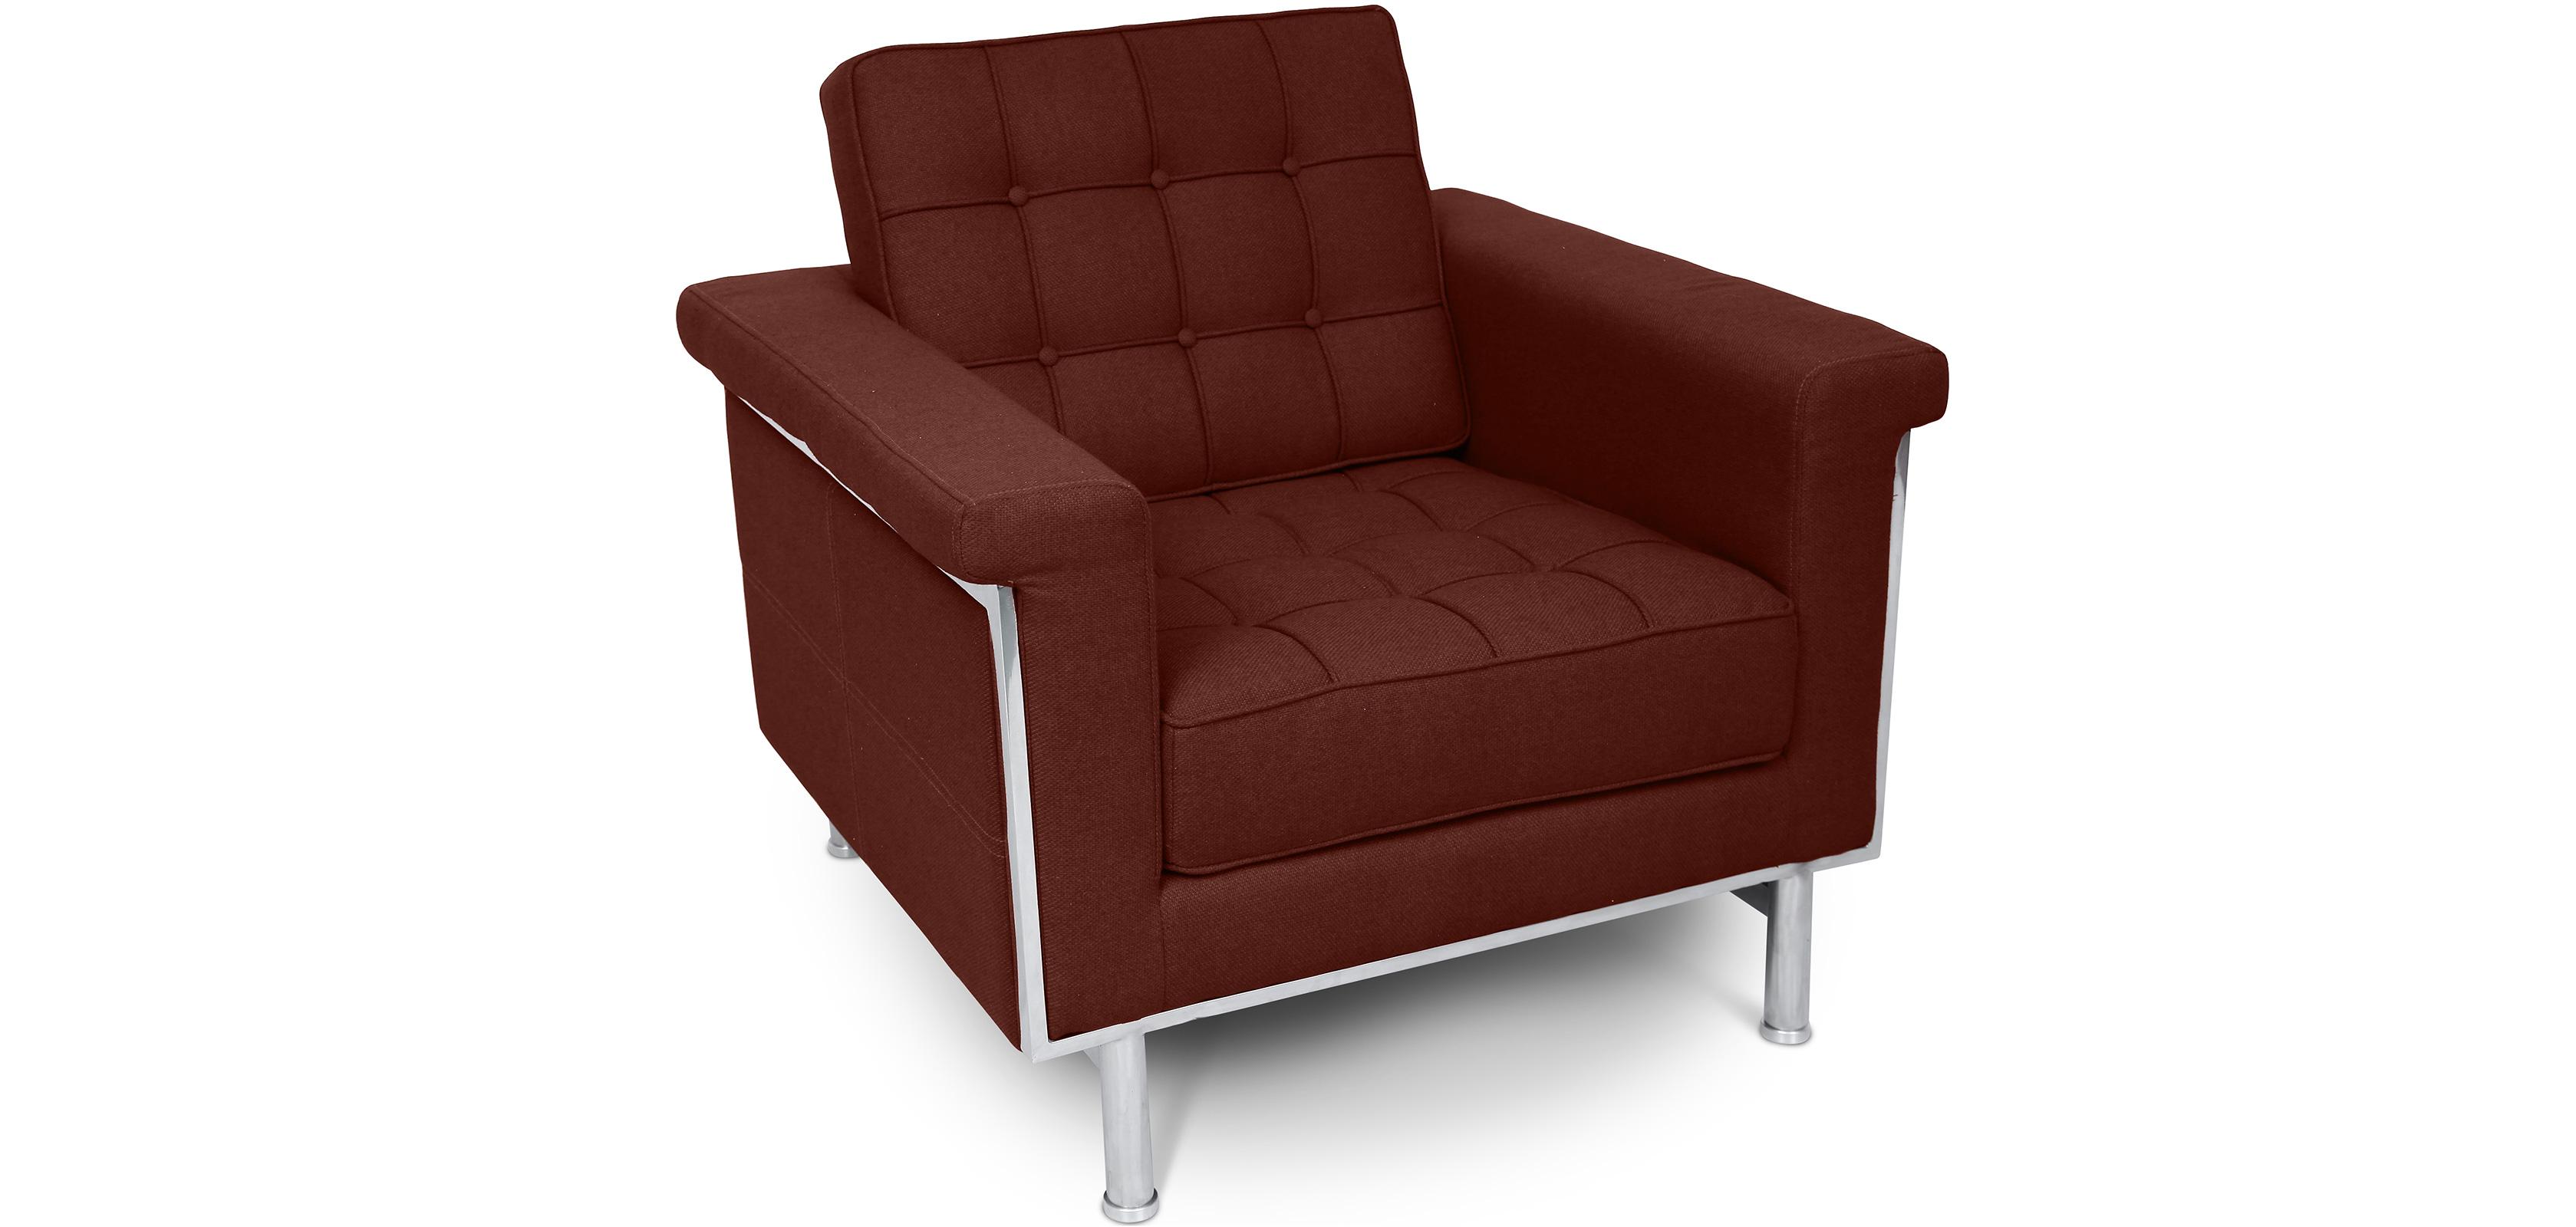 fauteuil inspiration ludwig mies van der rohe tissu. Black Bedroom Furniture Sets. Home Design Ideas